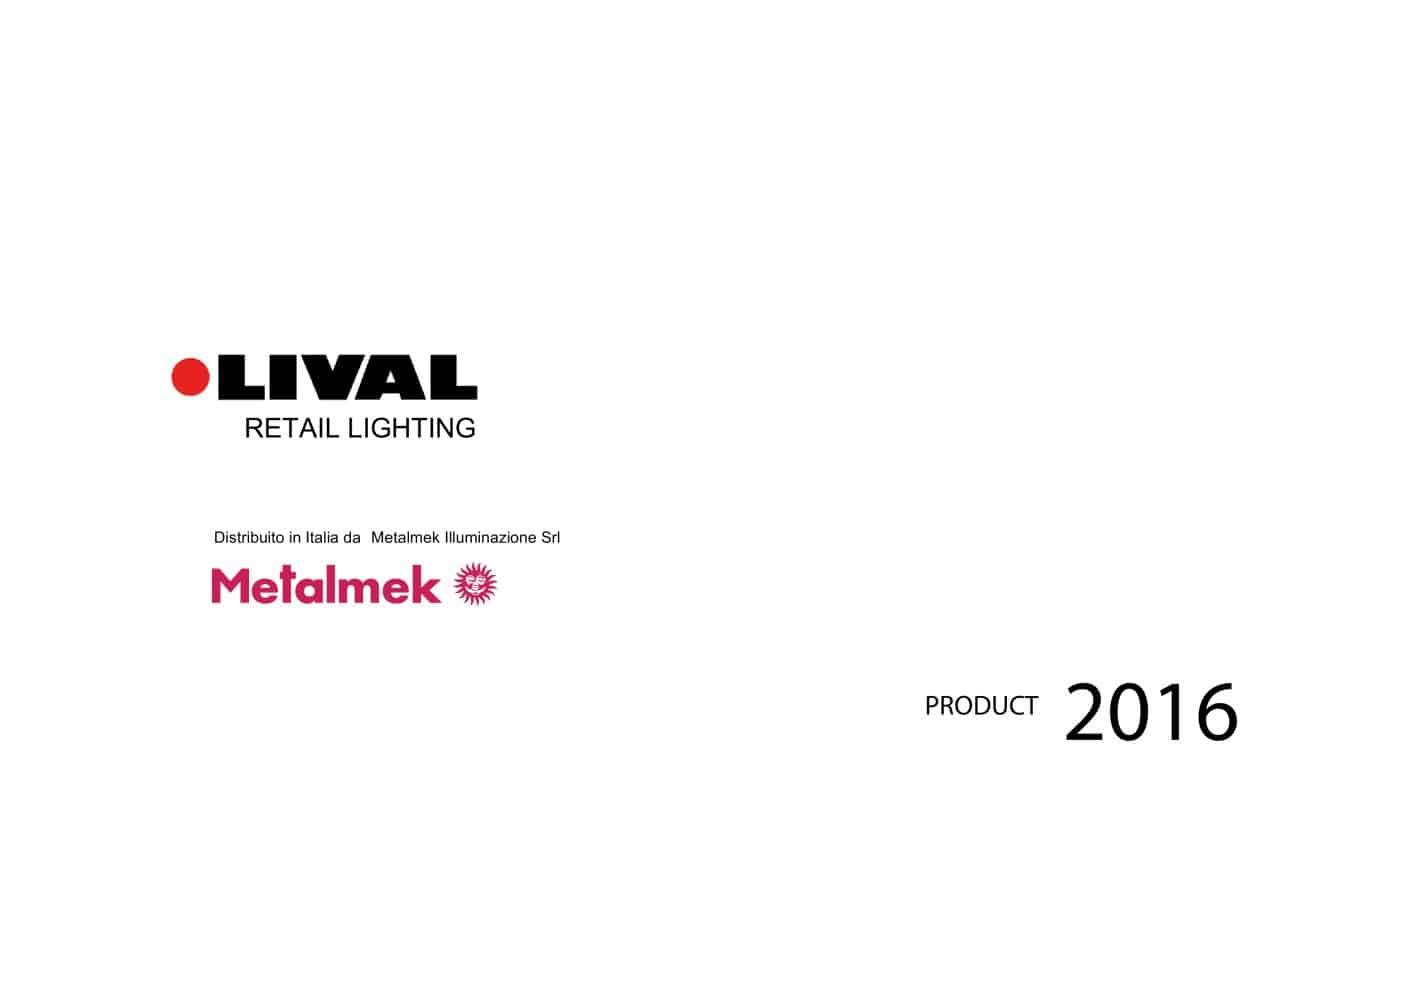 LIVAL RETAIL Catalog 2016 - Metalmek Illuminazione - PDF Catalogues ...